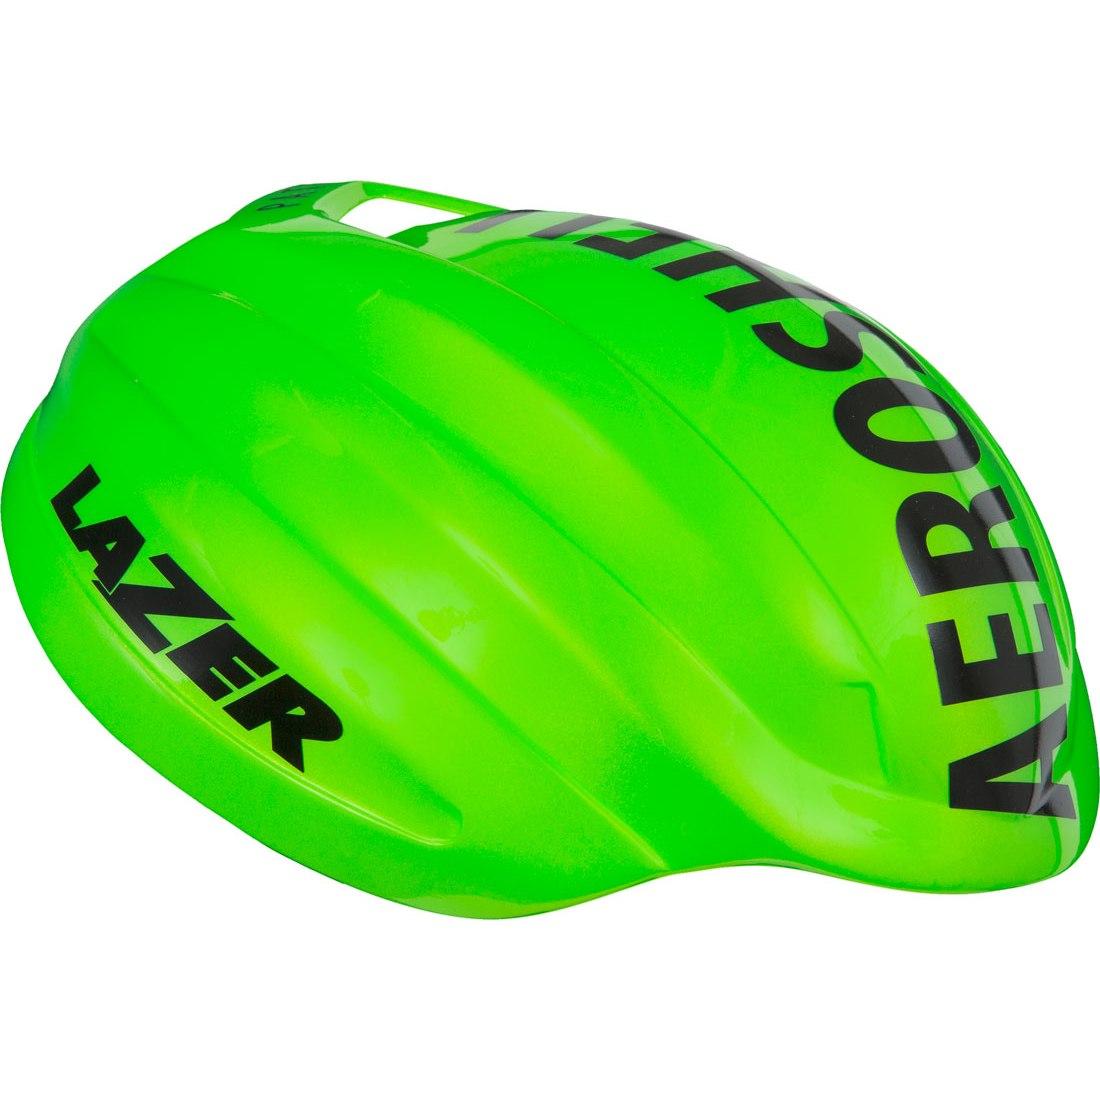 Lazer Aeroshell for Z1 - flash green